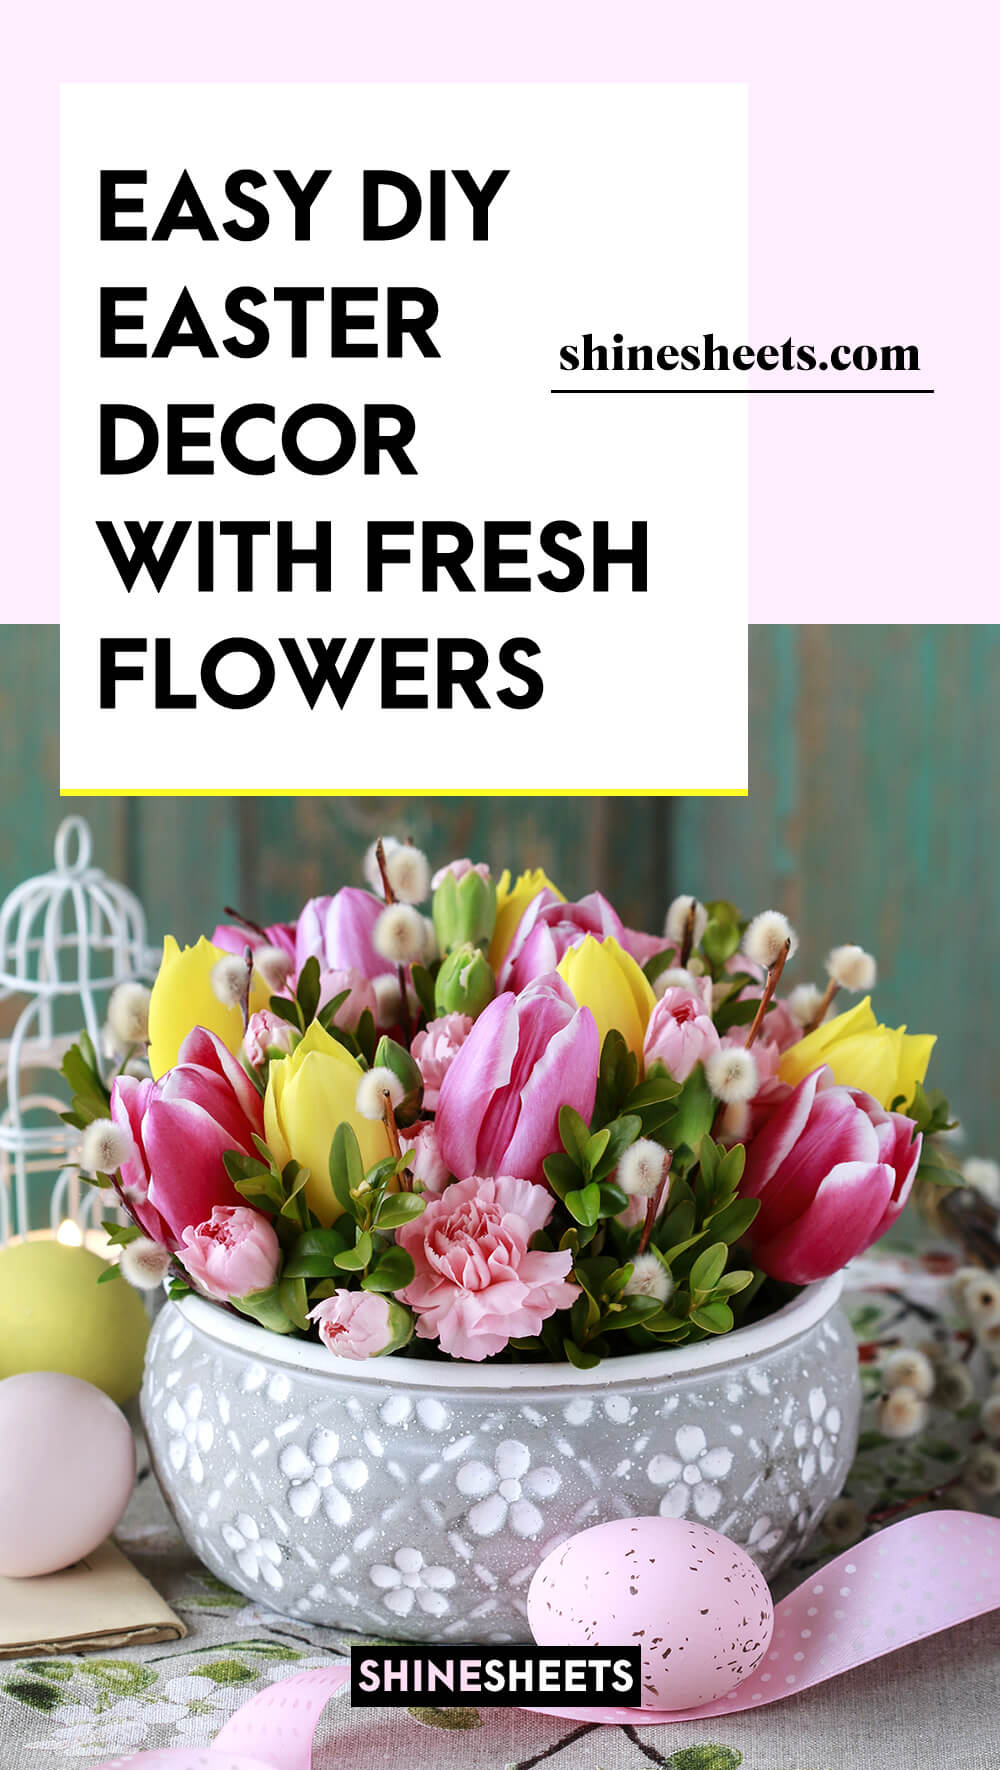 DIY EASTER DECOR WITH FRESH FLOWER